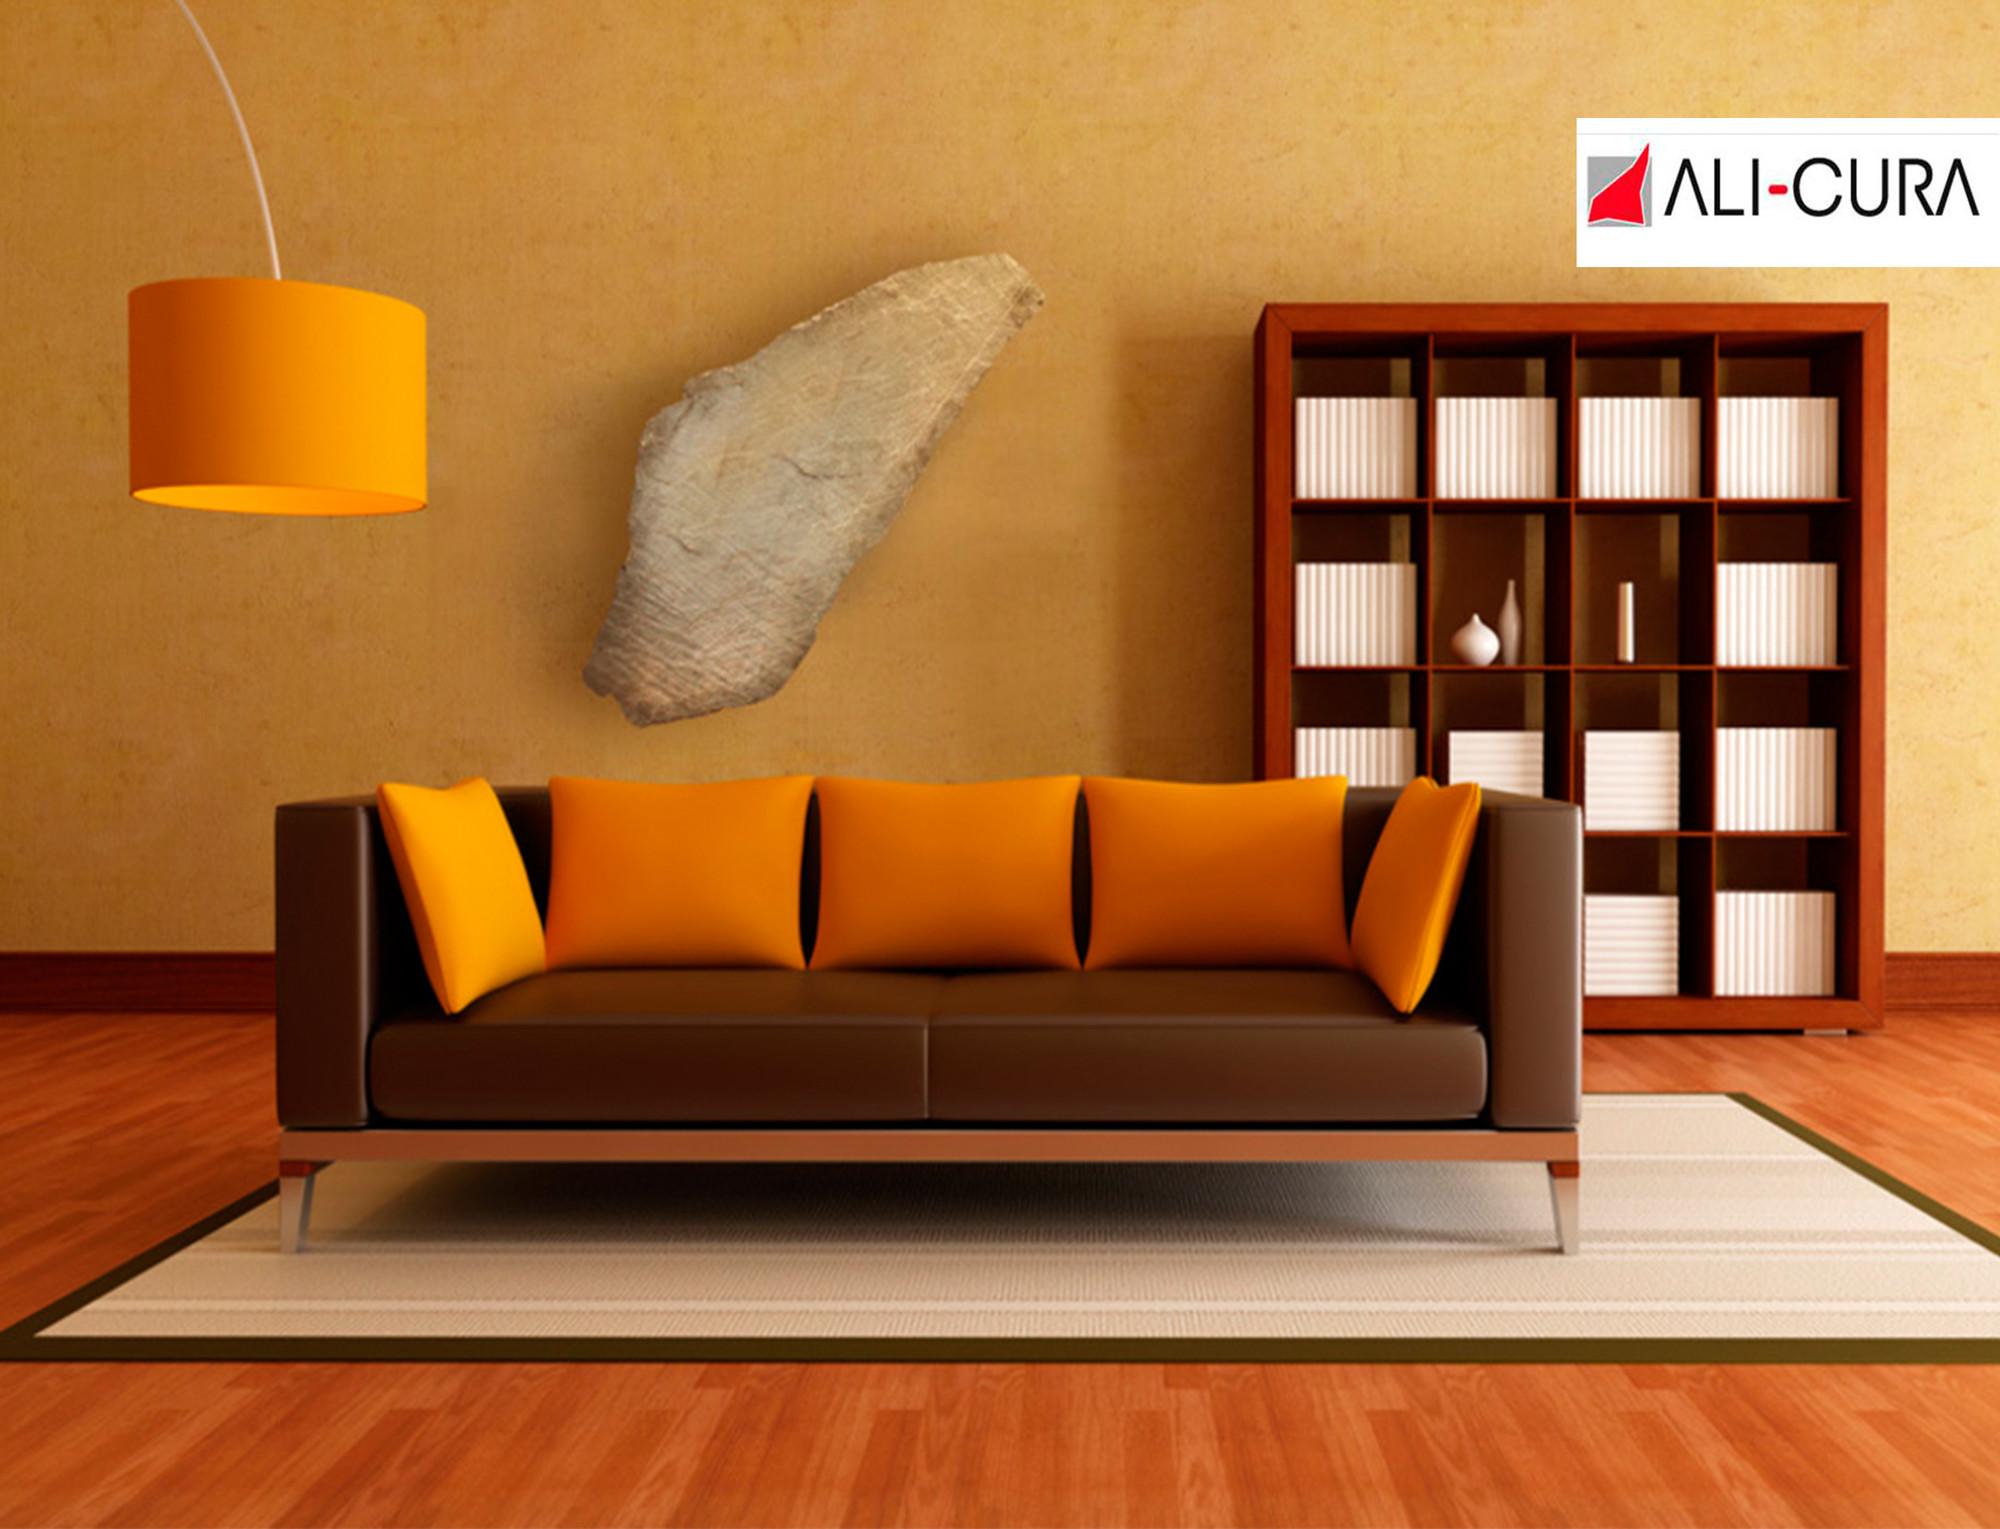 Ali cura en plataforma arquitectura plataforma arquitectura for Ali muebles ferrol catalogo